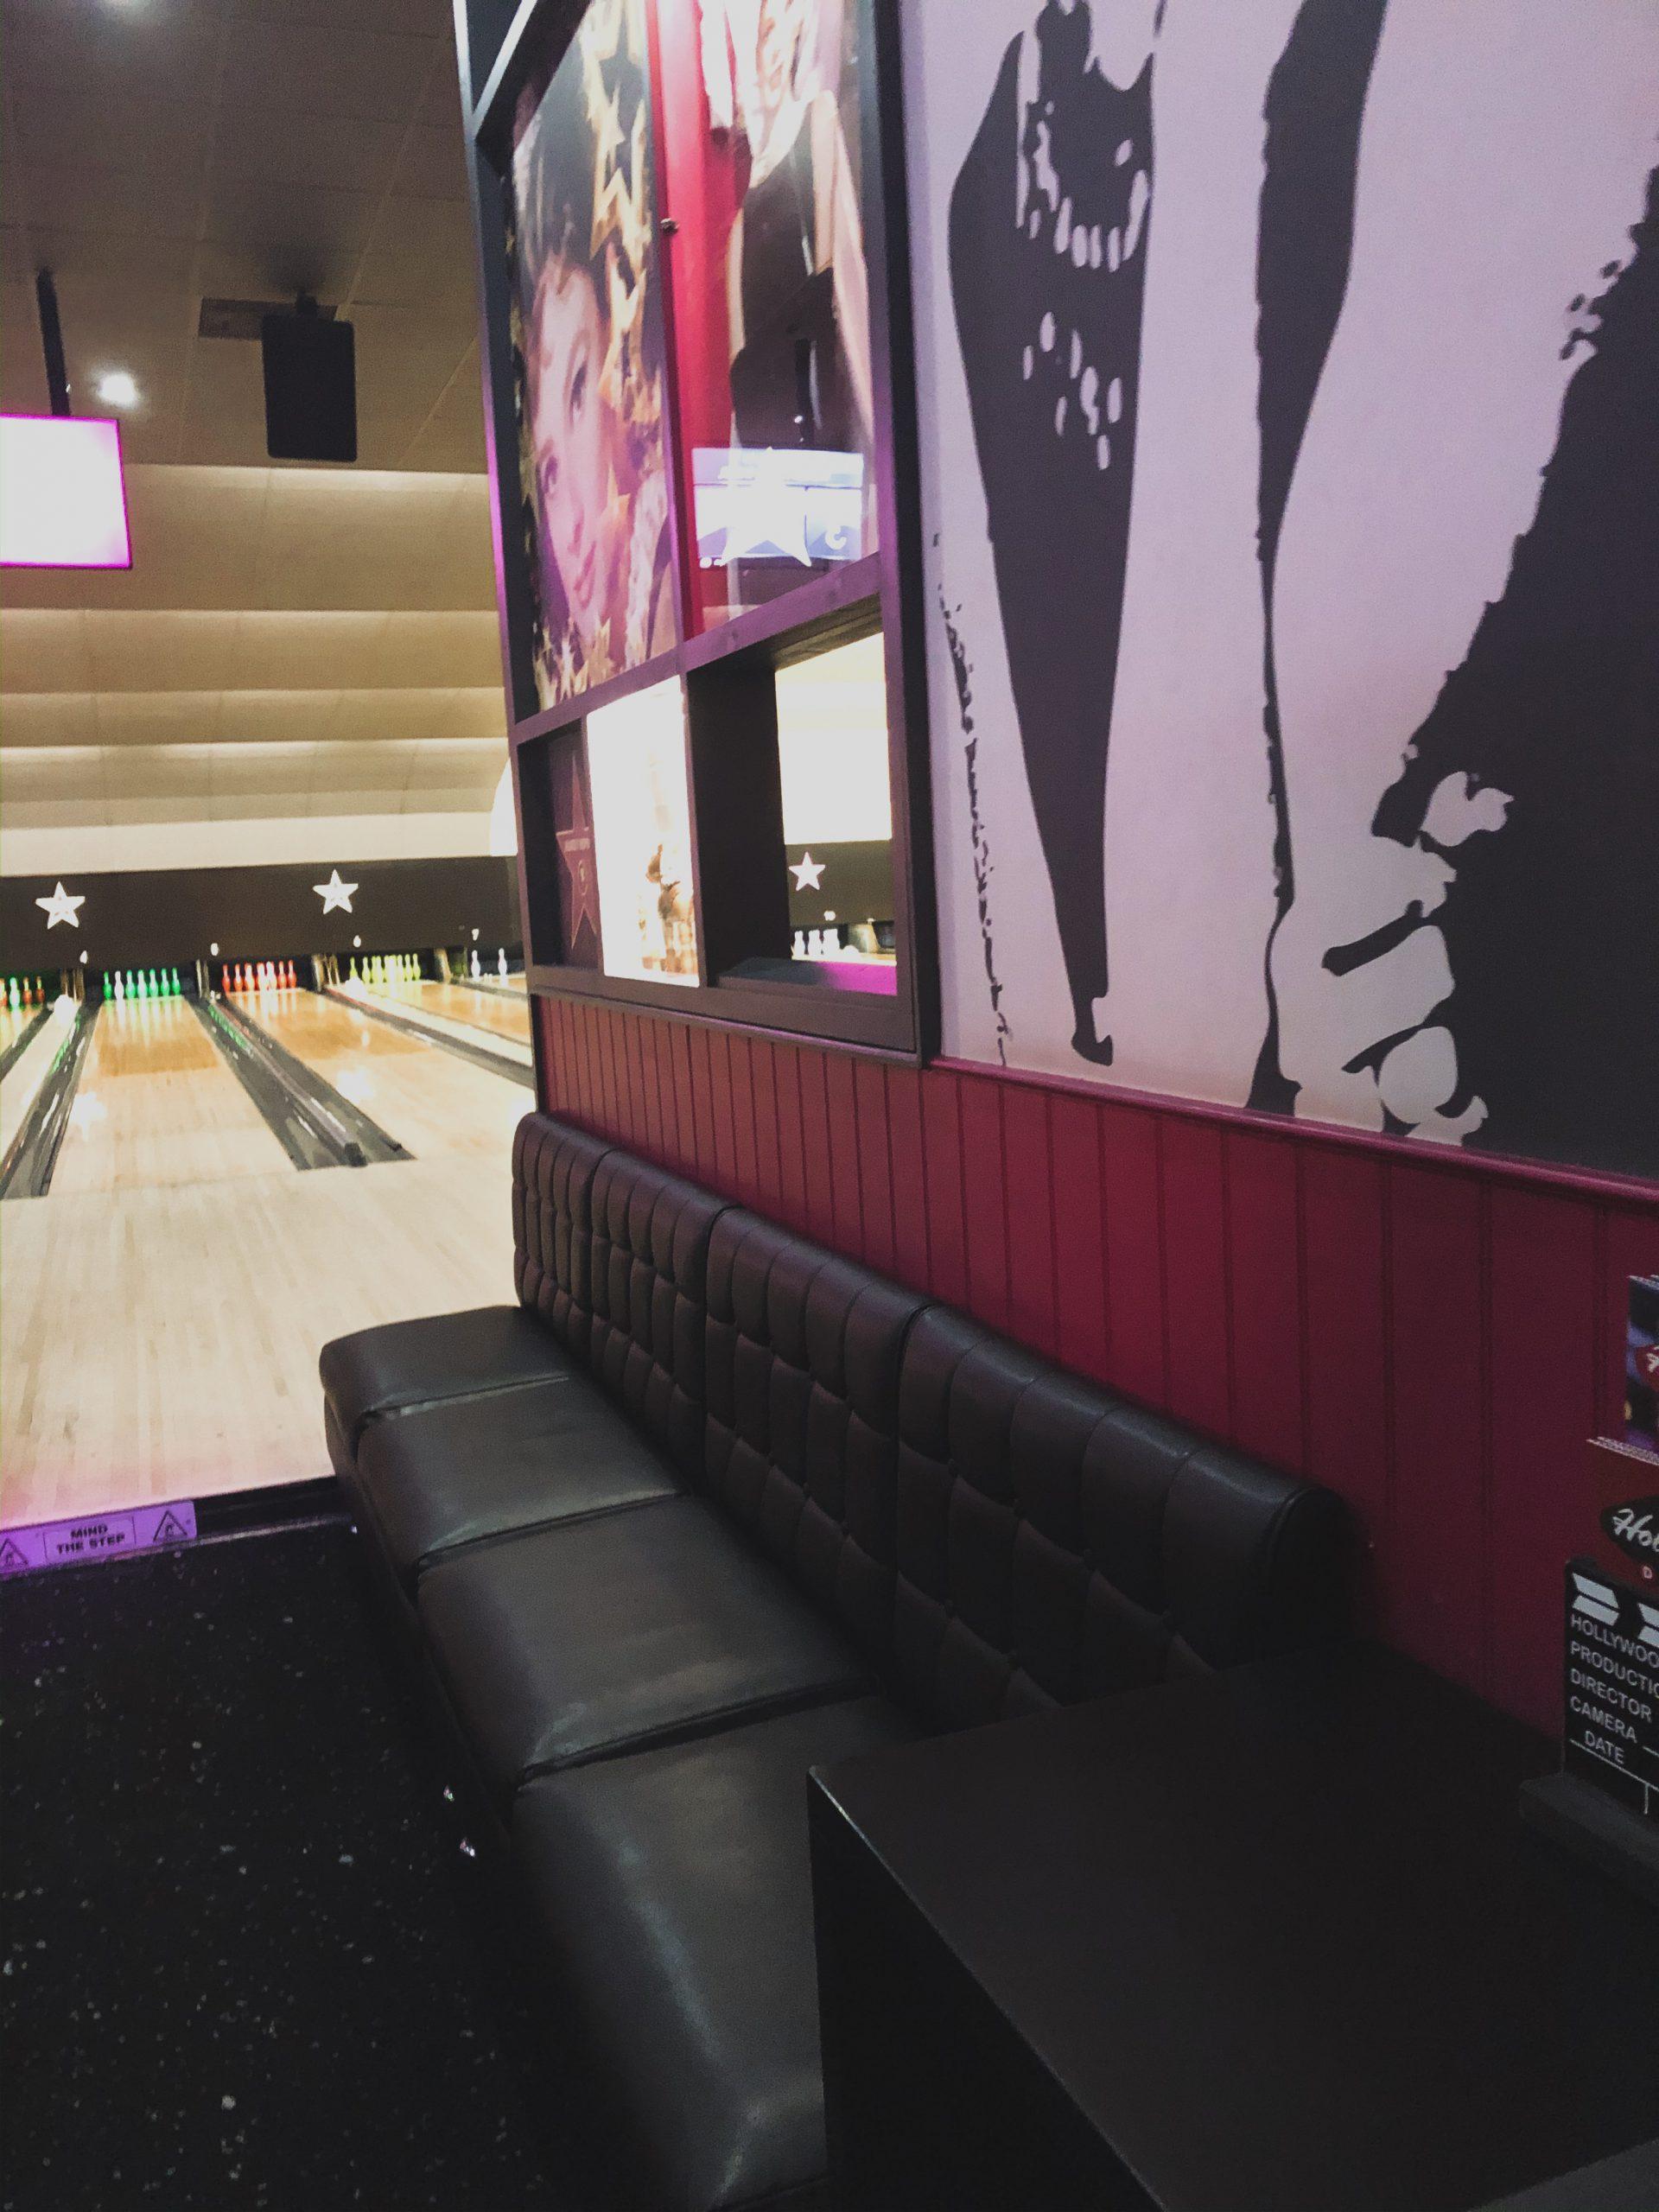 Sating area VIP lanes Hollywood bowl Merdian.